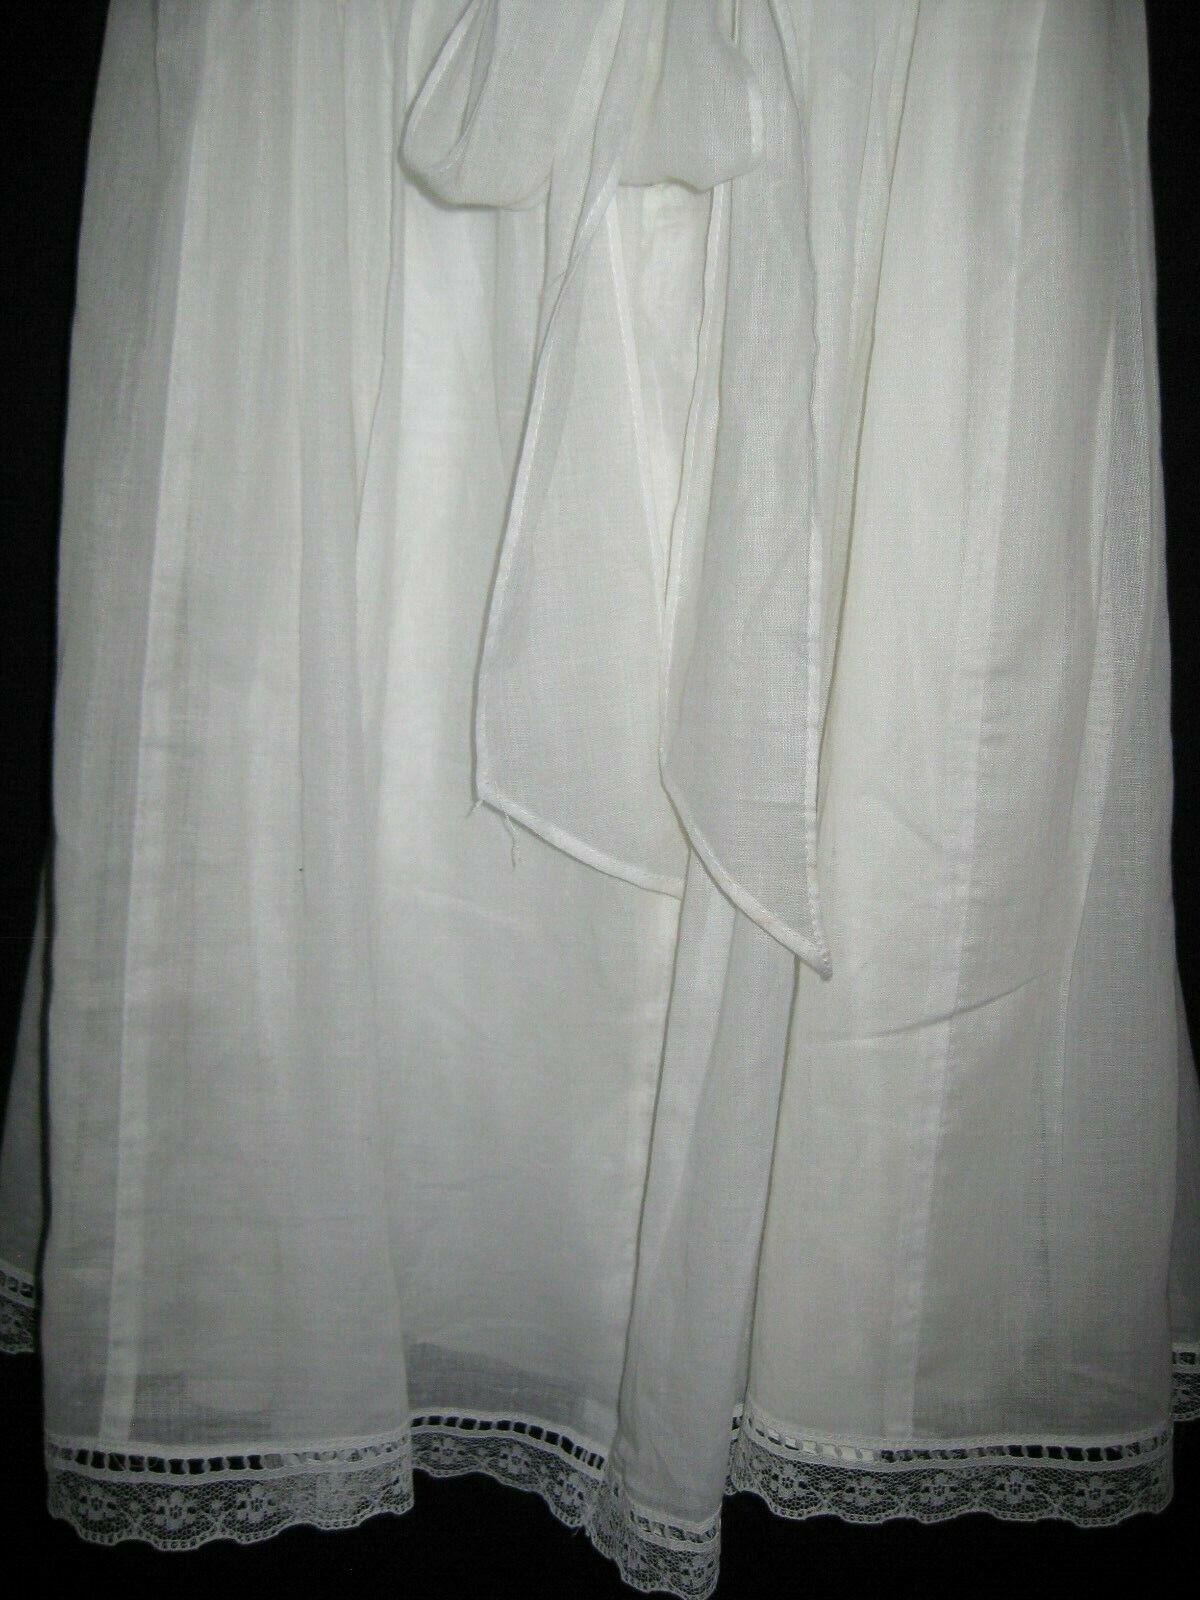 Gunne Sax White Dress Girls Size 12 Pre-Owned - image 9